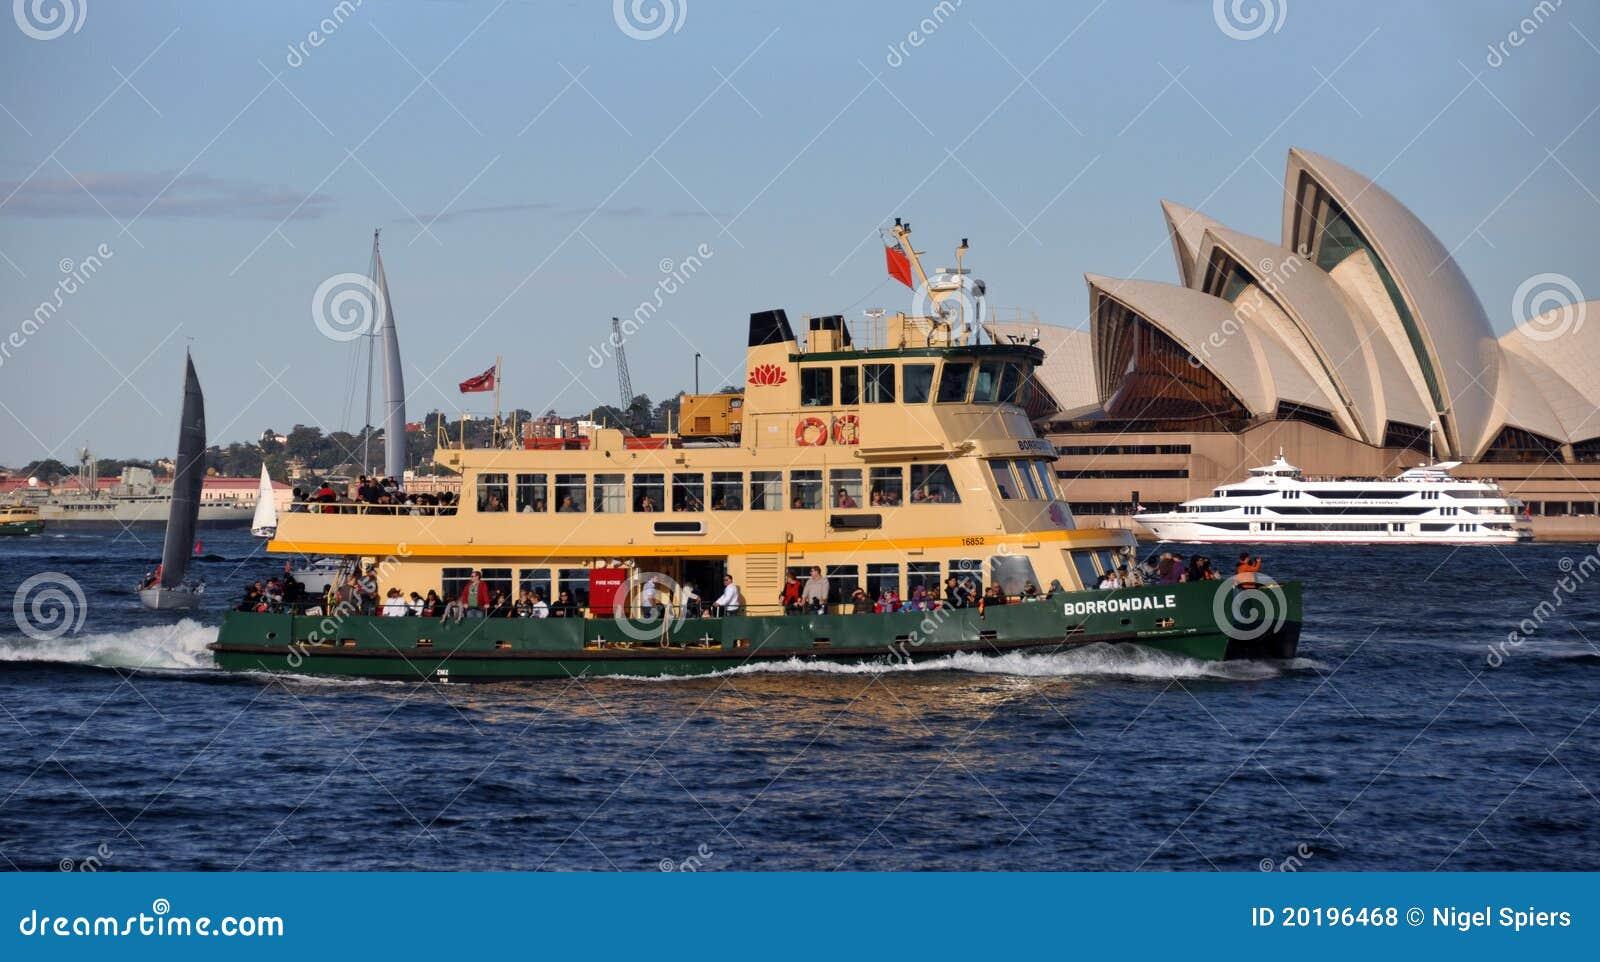 Sydney Harbour Ferry Boat Australia Editorial Stock Photo - Image: 20196468